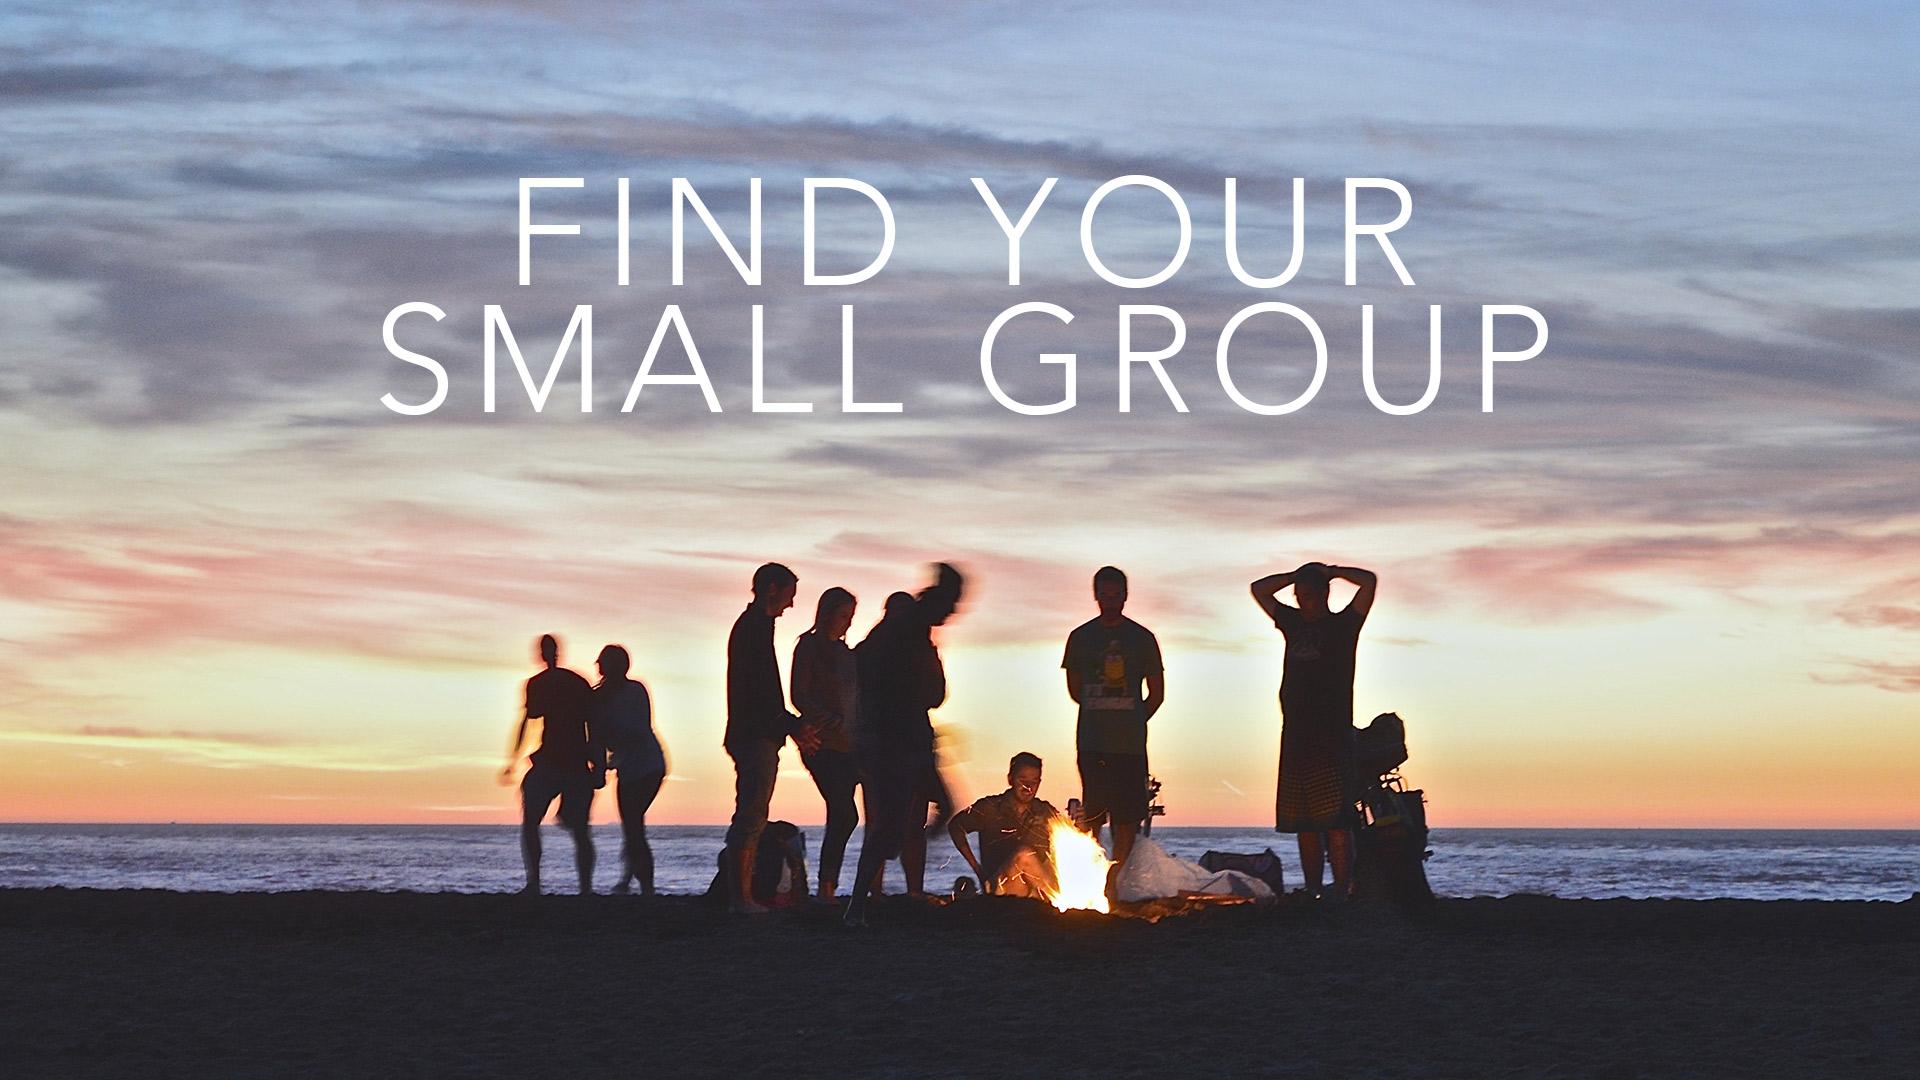 smallgroups_16x9.jpg